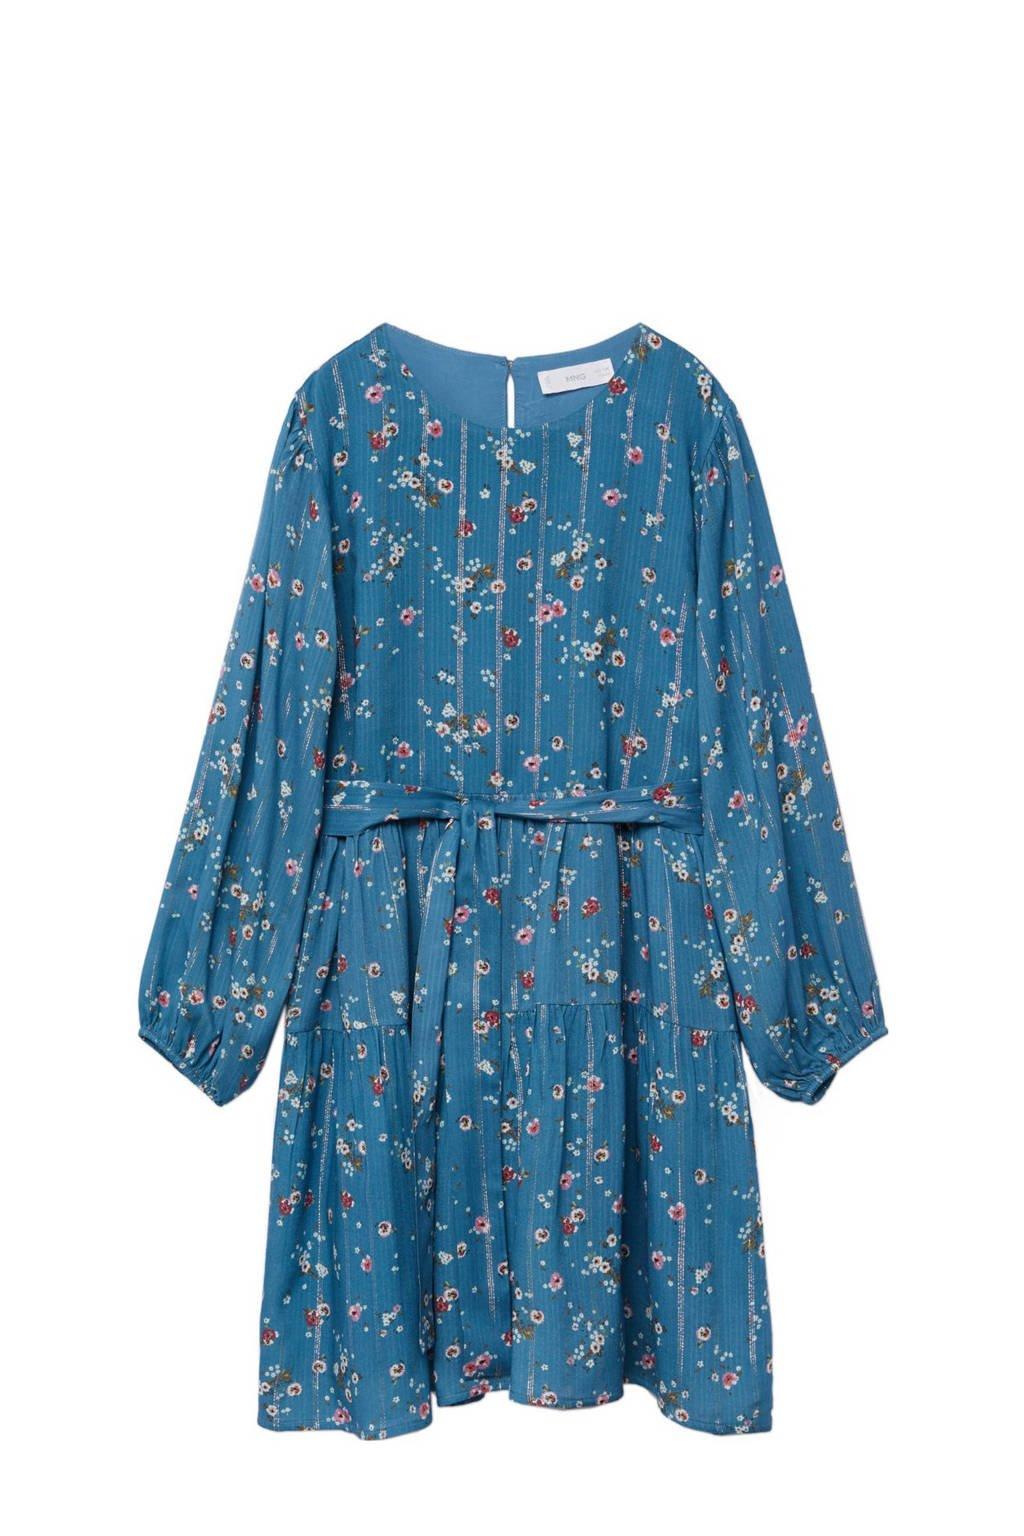 Mango Kids gebloemde jurk blauw/roze, Blauw/roze